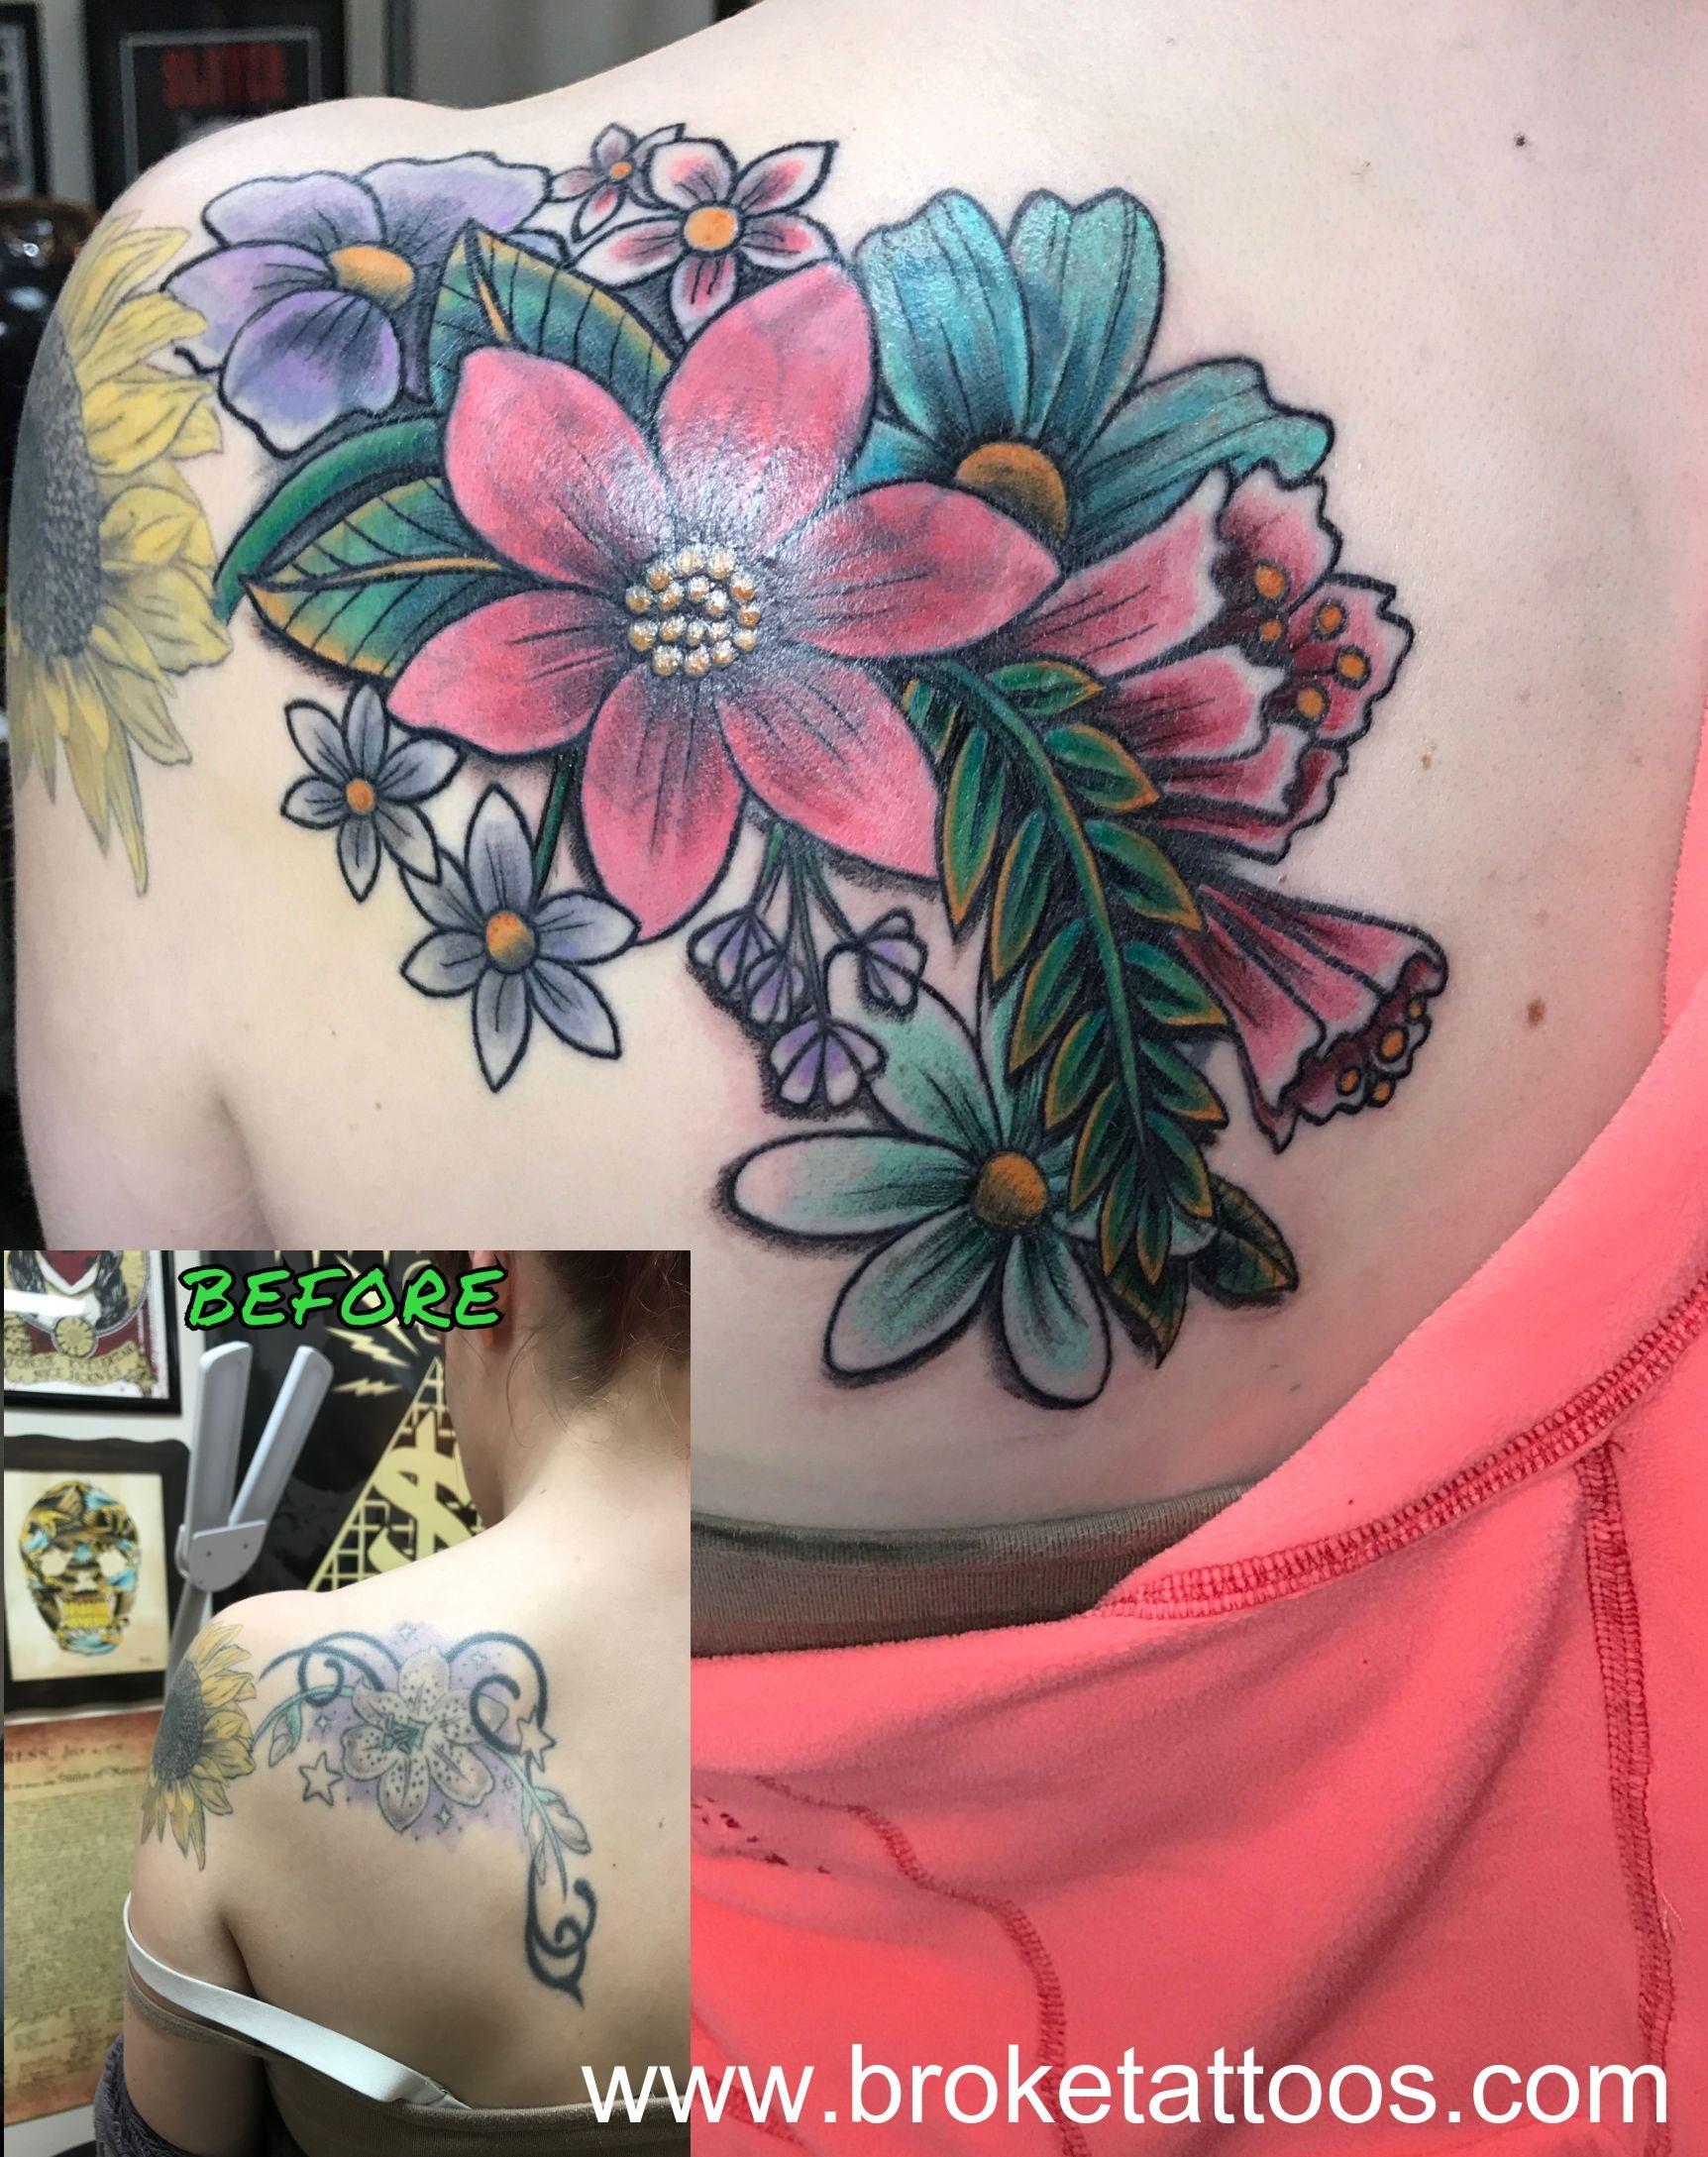 broketattoos viciousinksh ink tattoos michigantattooer coveruptattoo floral inked girlswithtattoos tattooed